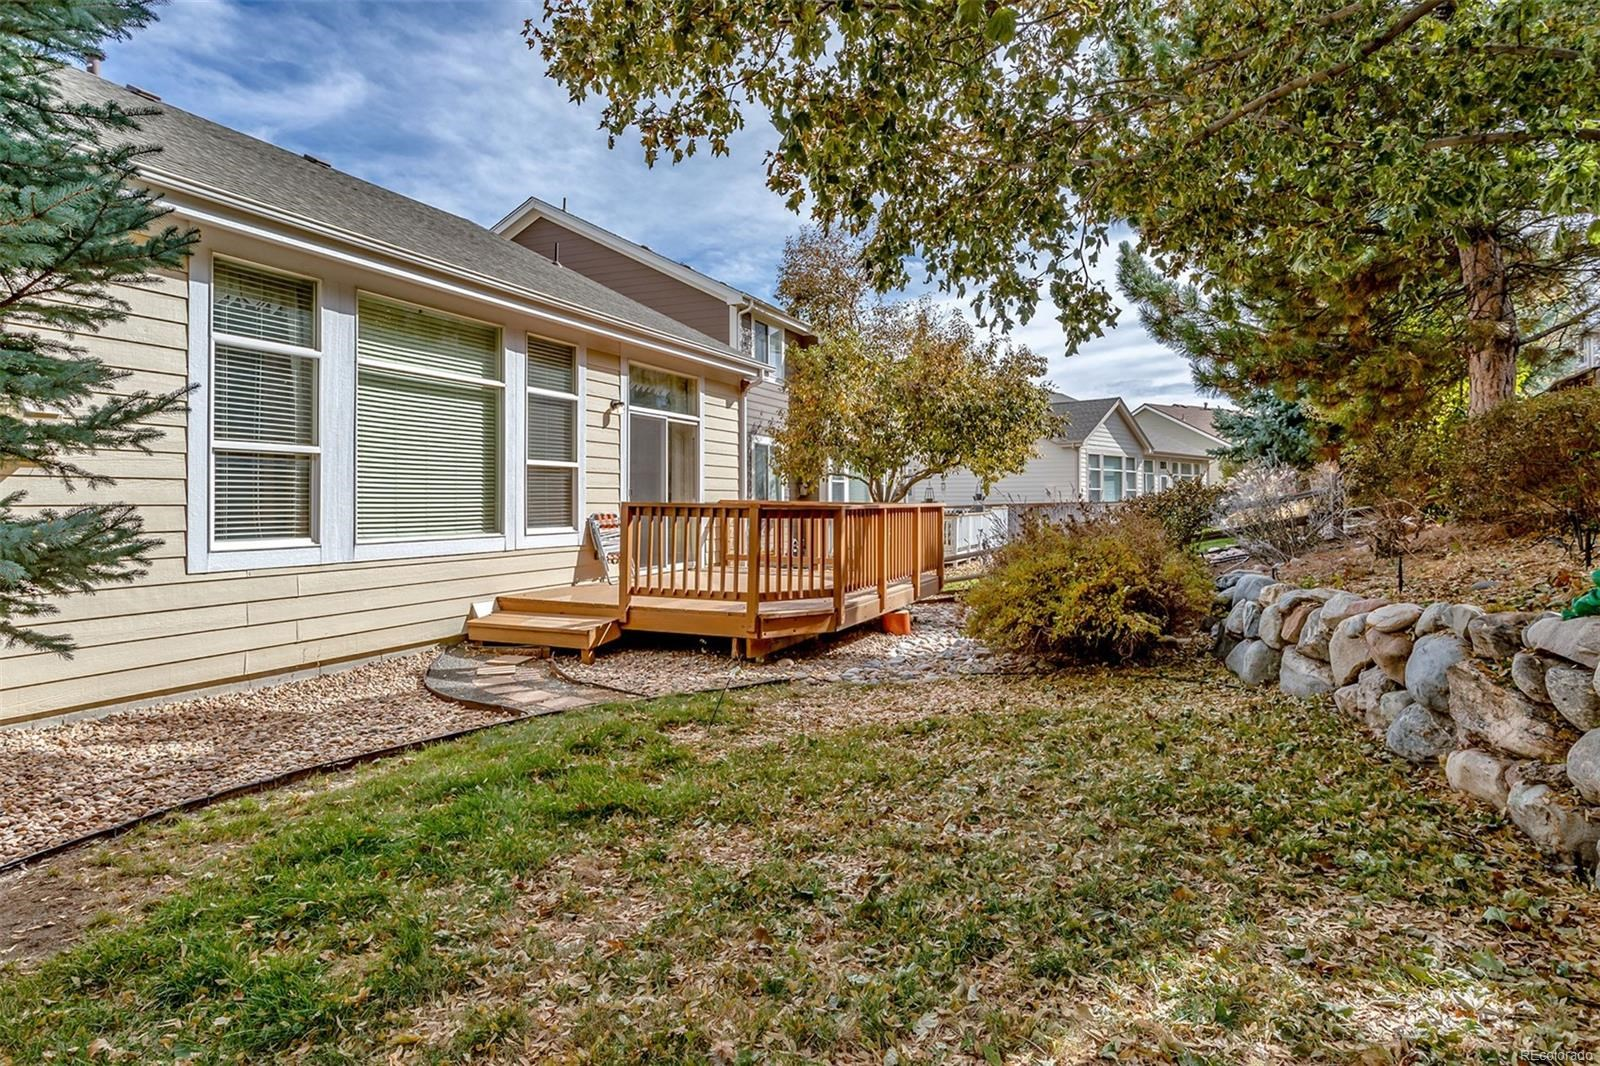 MLS# 9233847 - 27 - 10231 Nickolas Avenue, Highlands Ranch, CO 80130